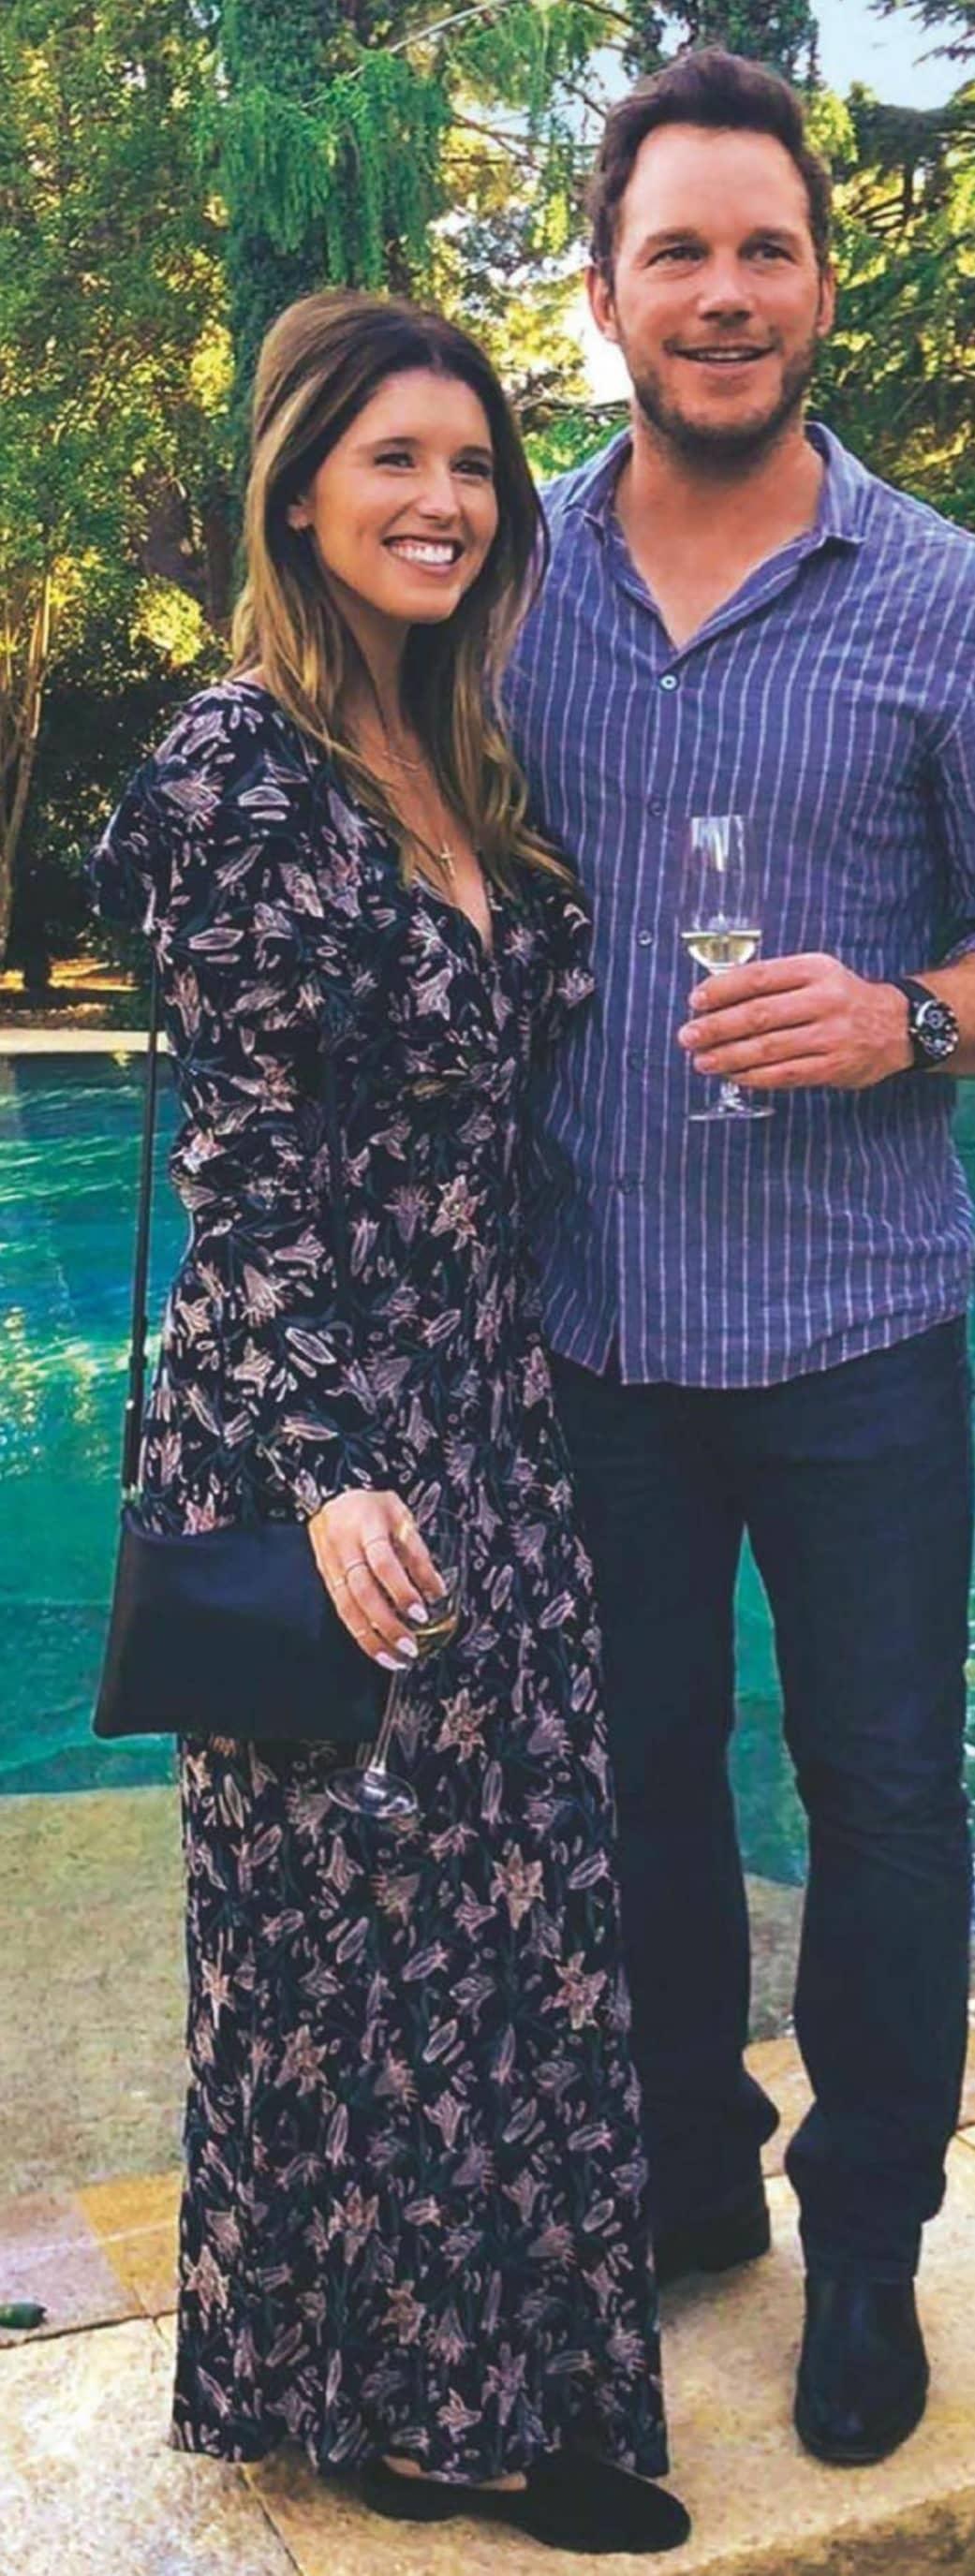 Hollywood Star Chris Pratt To Wed Arnie's Daughter Katherine Schwarzenegger